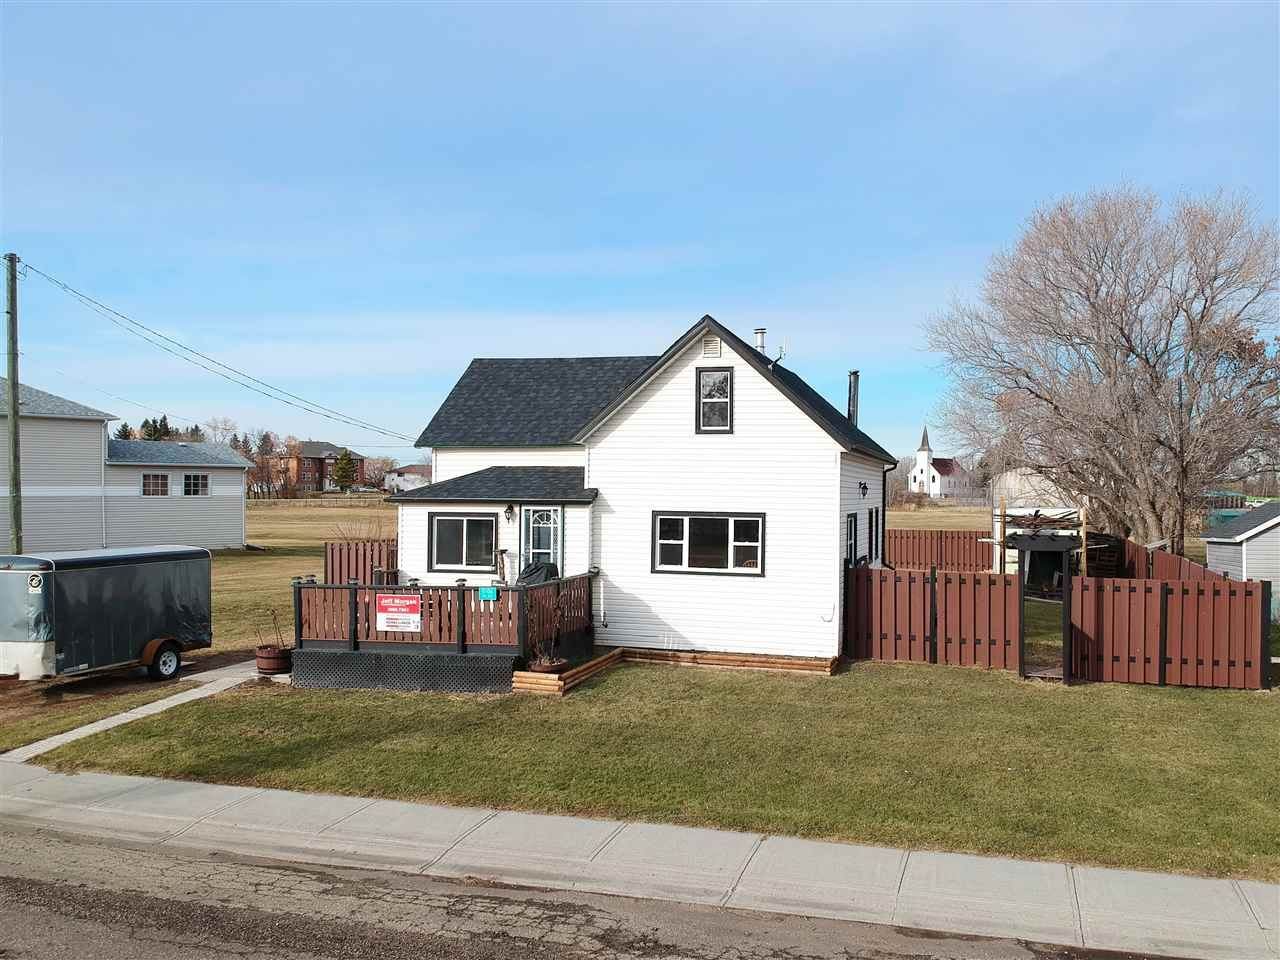 Main Photo: 5106 49 Avenue: Radway House for sale : MLS®# E4229683